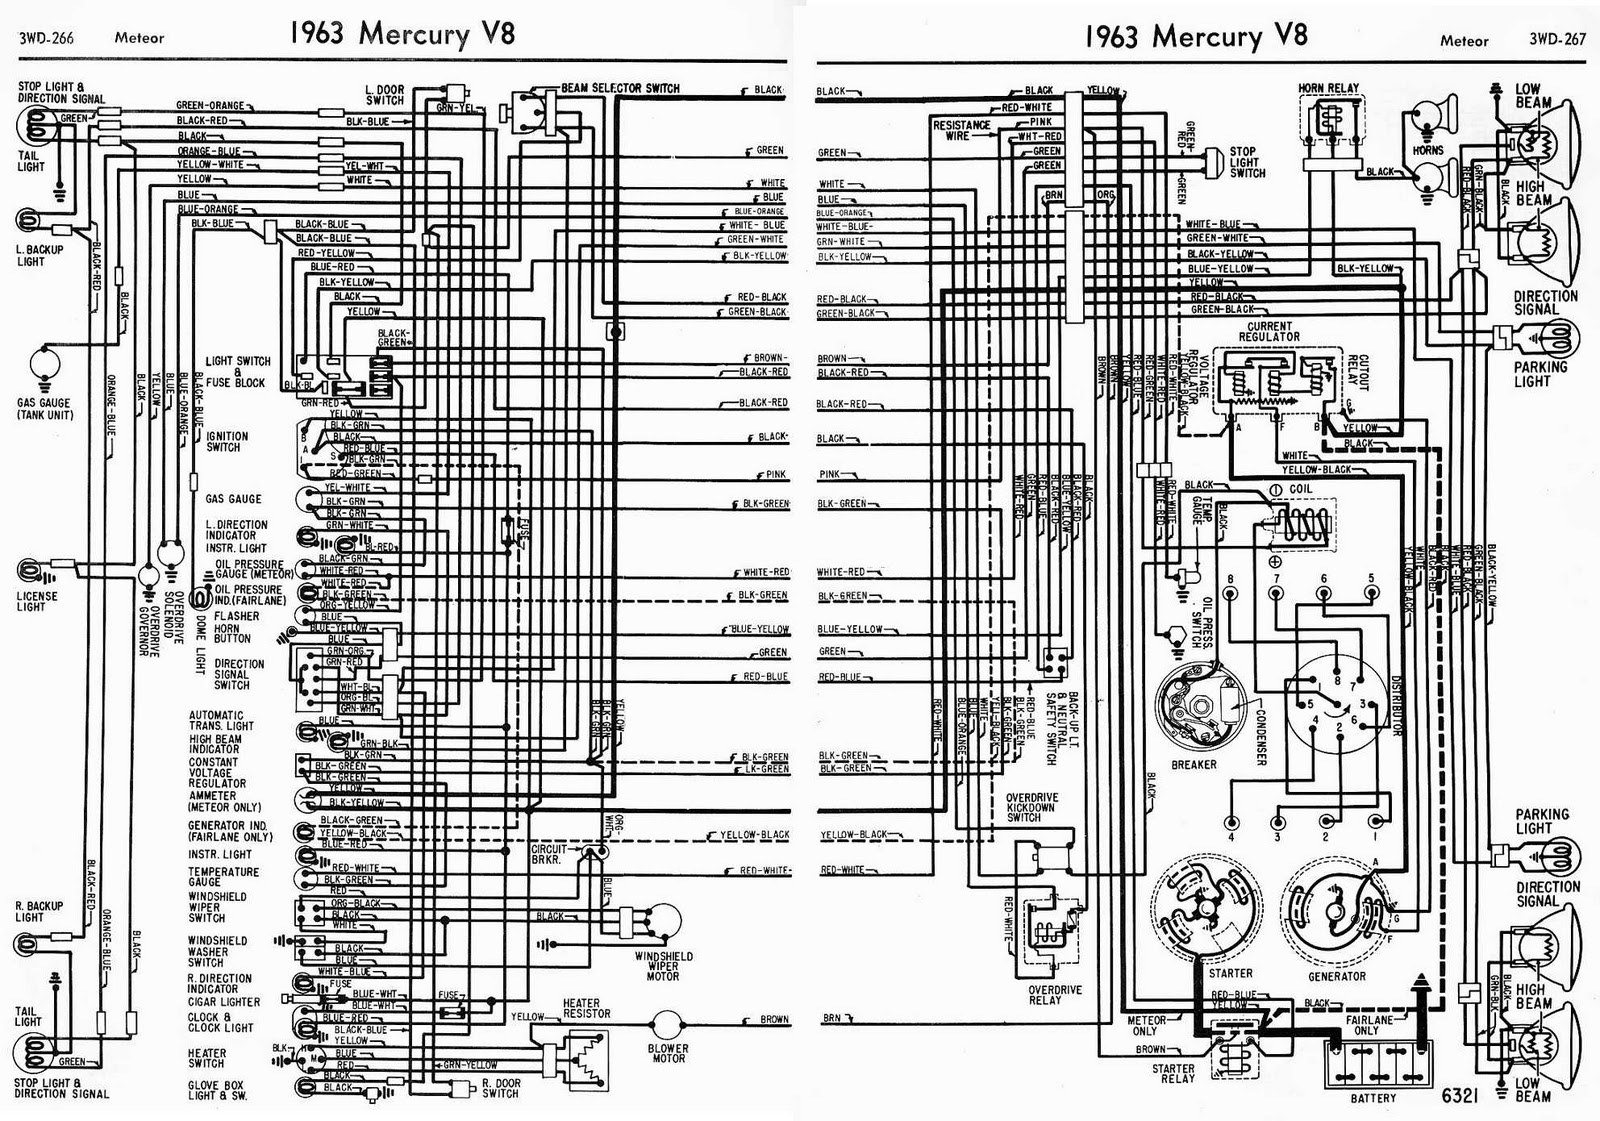 Miraculous Wiring Diagram For 1981 Cb900 C Get Free Image About Wiring Diagram Wiring Cloud Orsalboapumohammedshrineorg